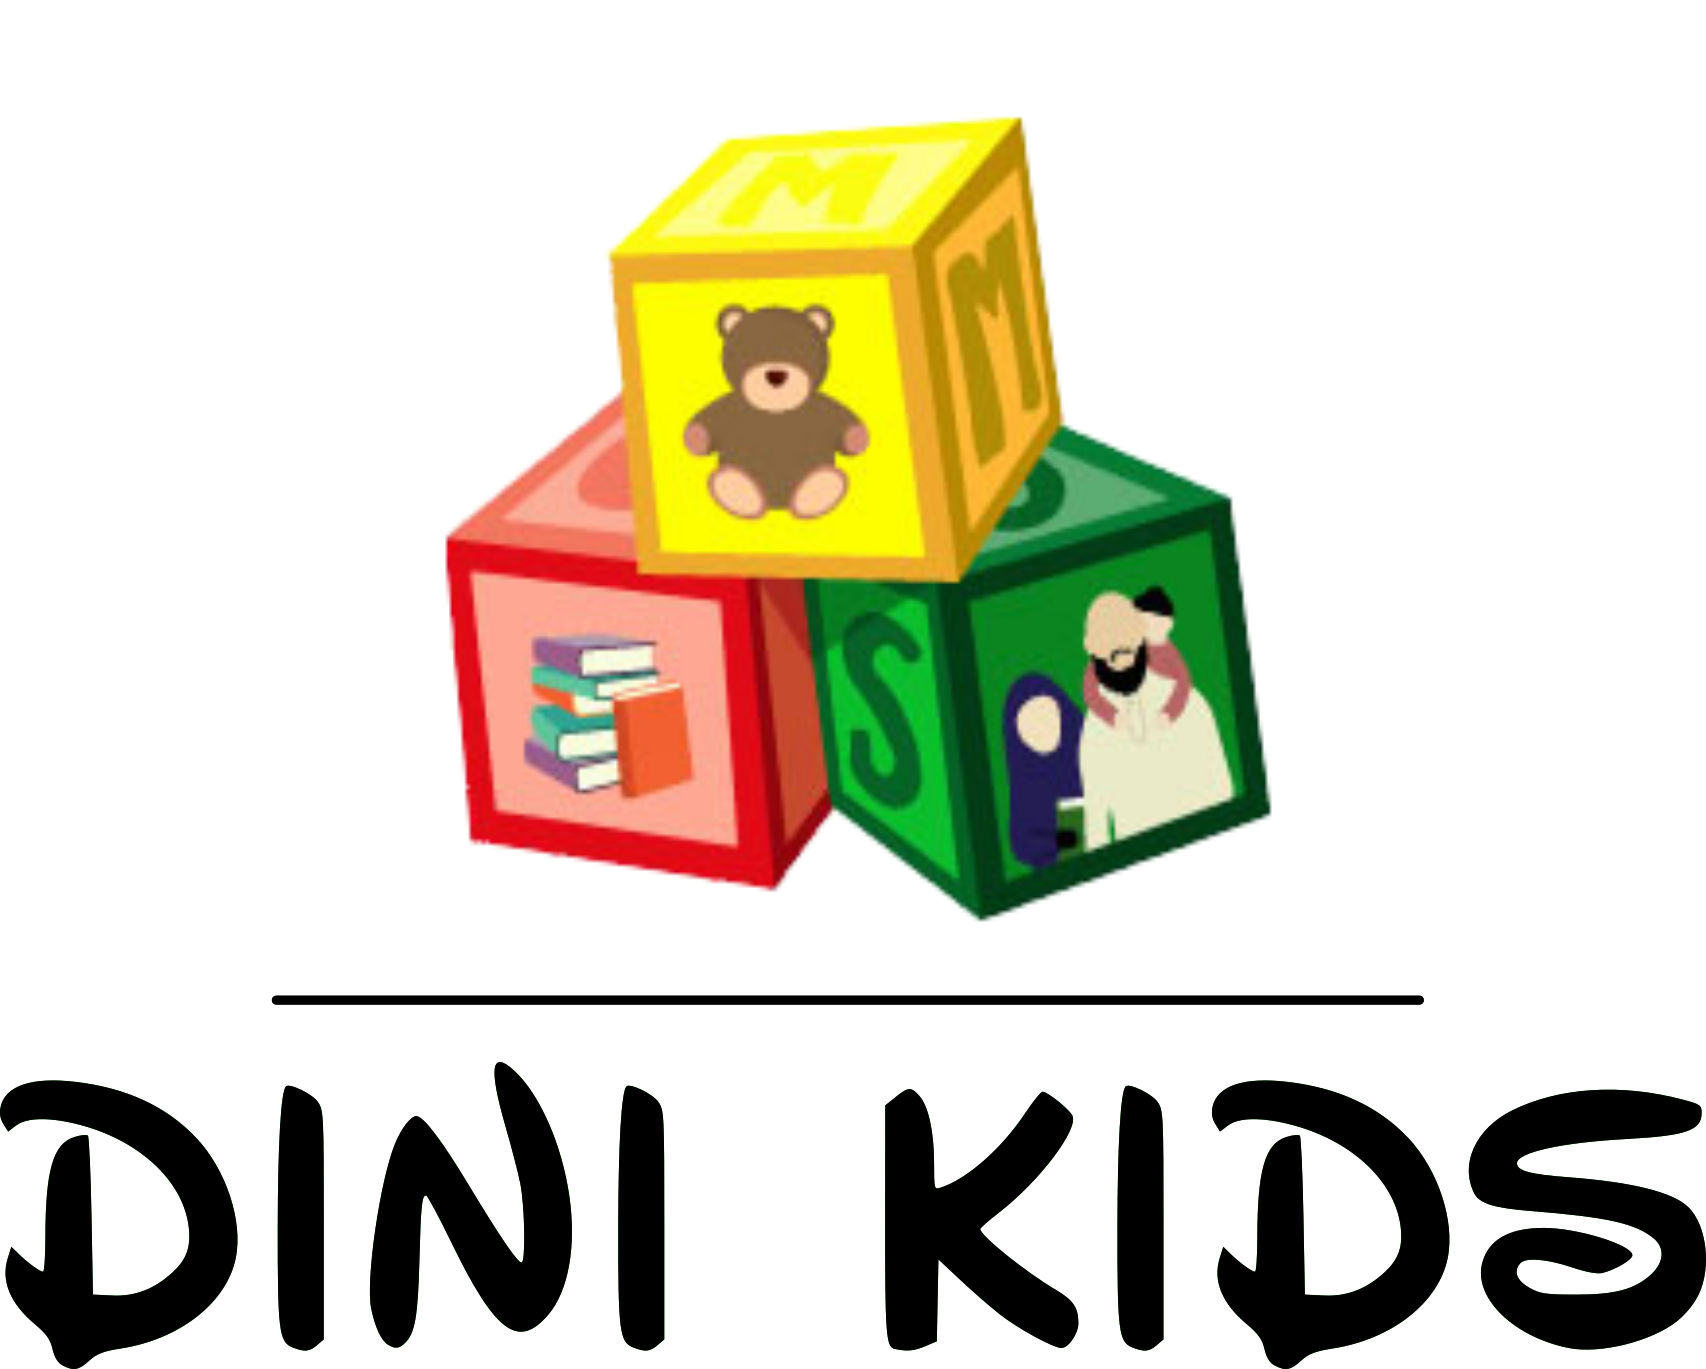 dini-kids